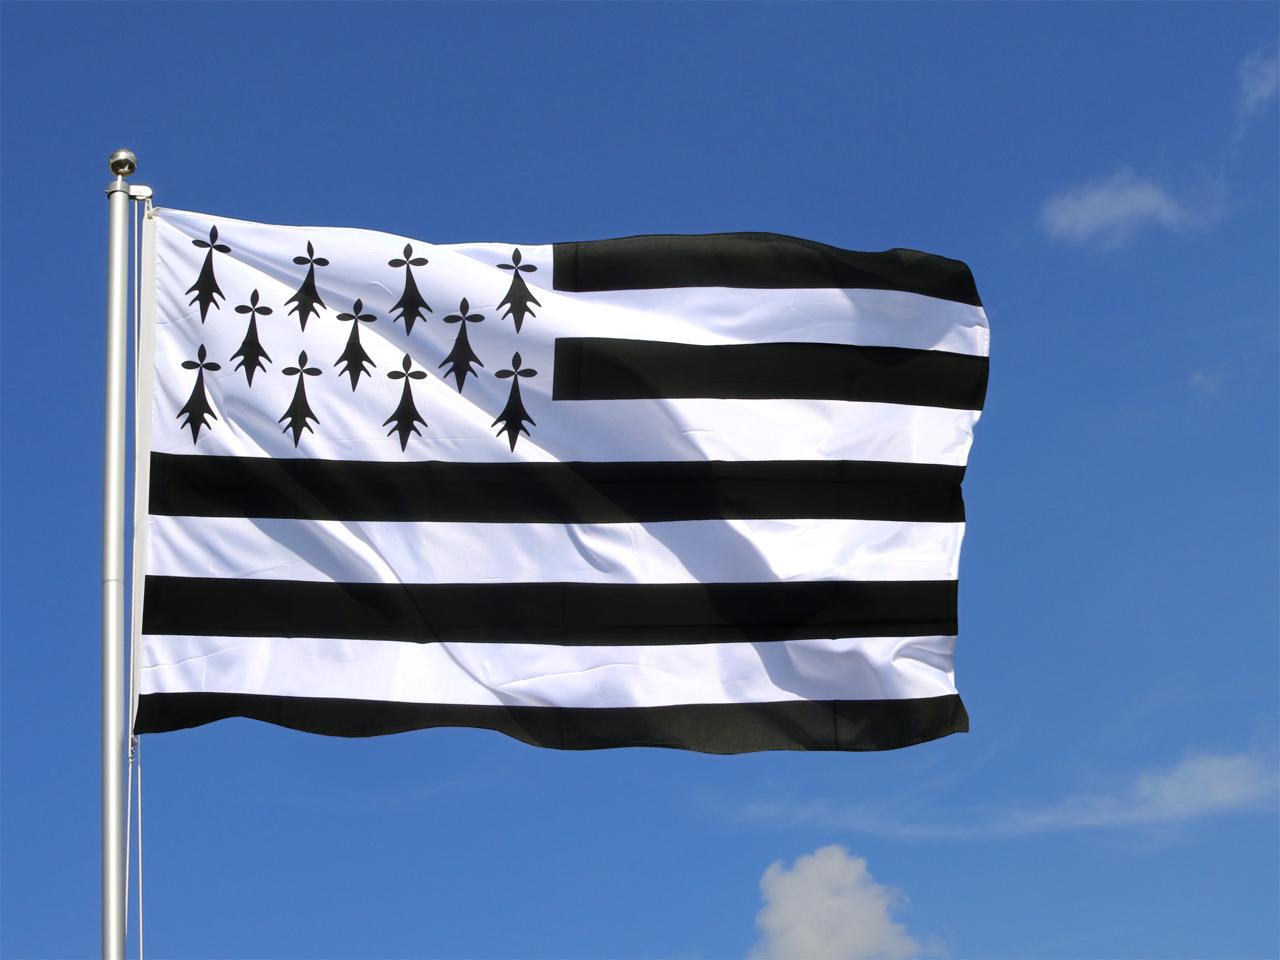 Marshall Islands Micronesia n 7132566 likewise Seychelles further MAJURO MARSHALL ISLANDS 492 as well Large Brittany Flag 6302 further Syria Hand Waving Flag 1495. on marshall islands